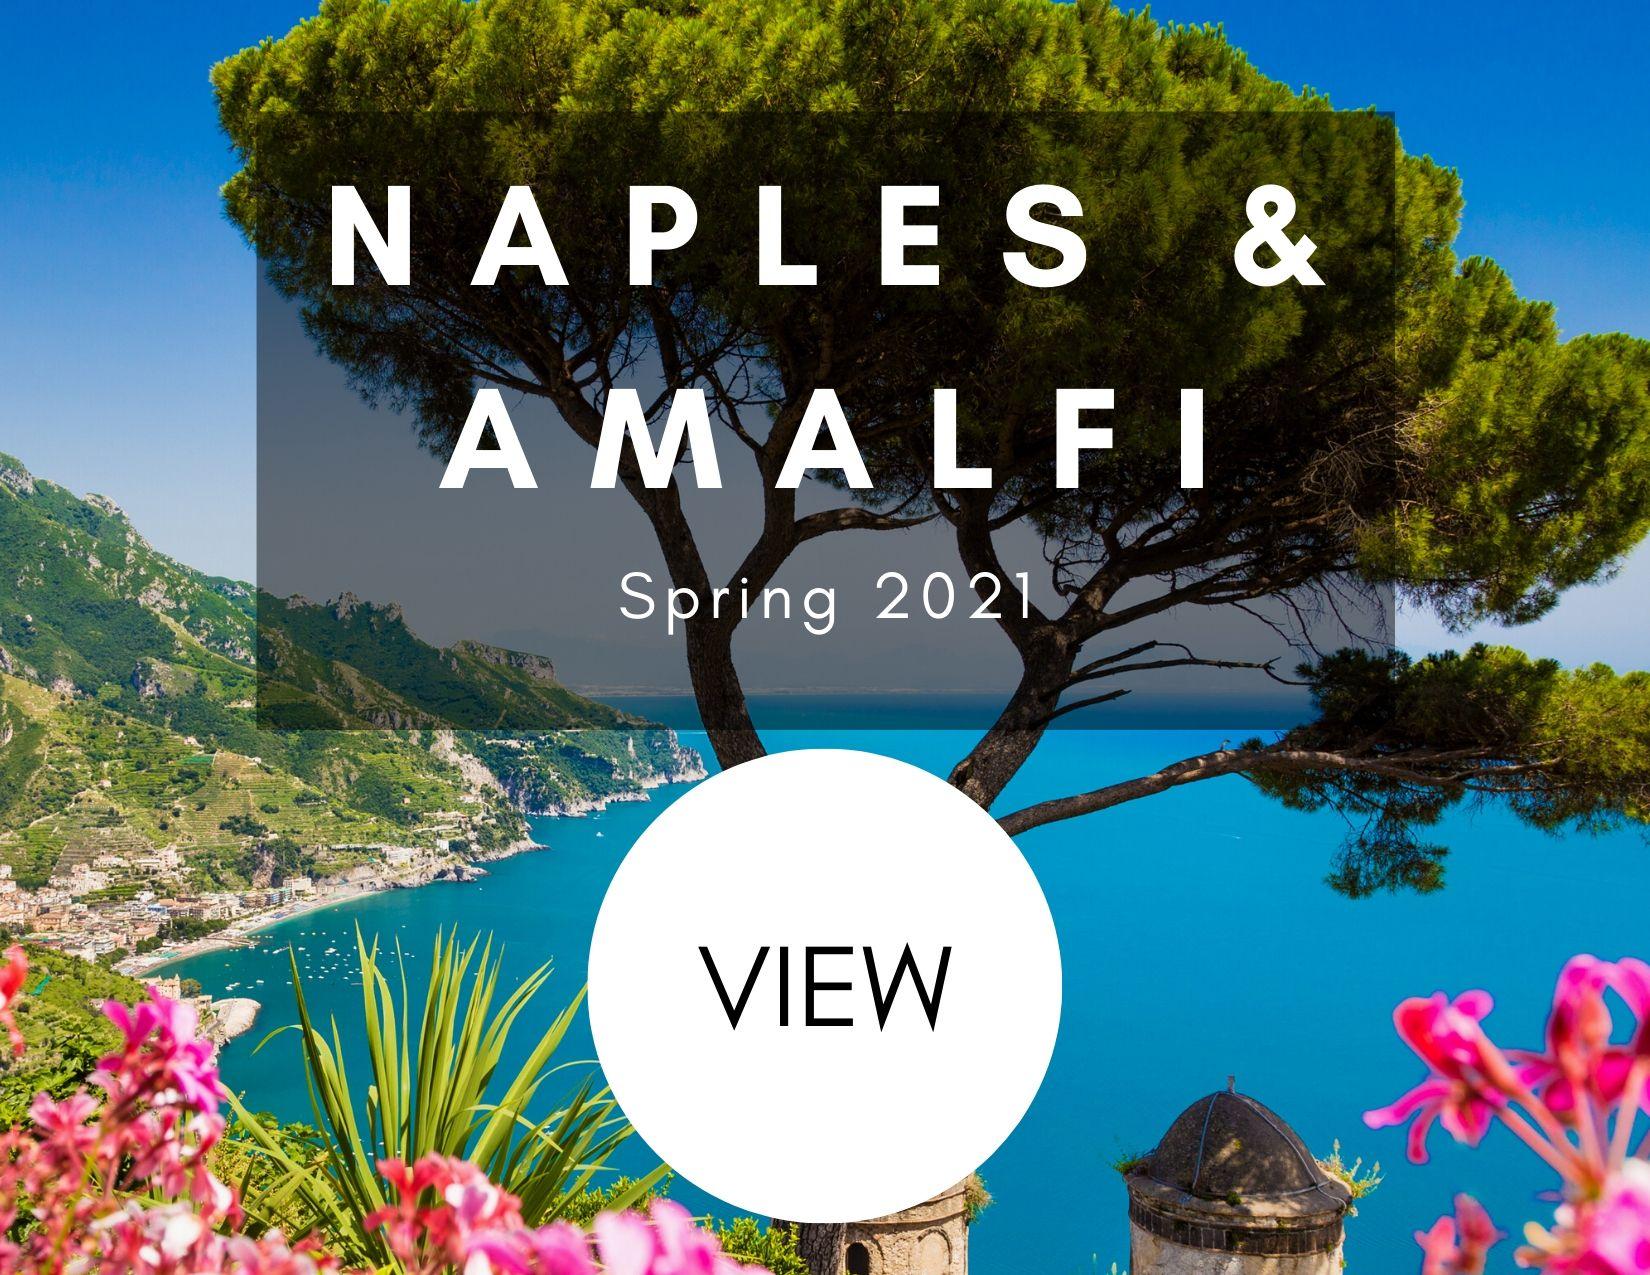 Naples & Amalfi Spring 2021.jpg